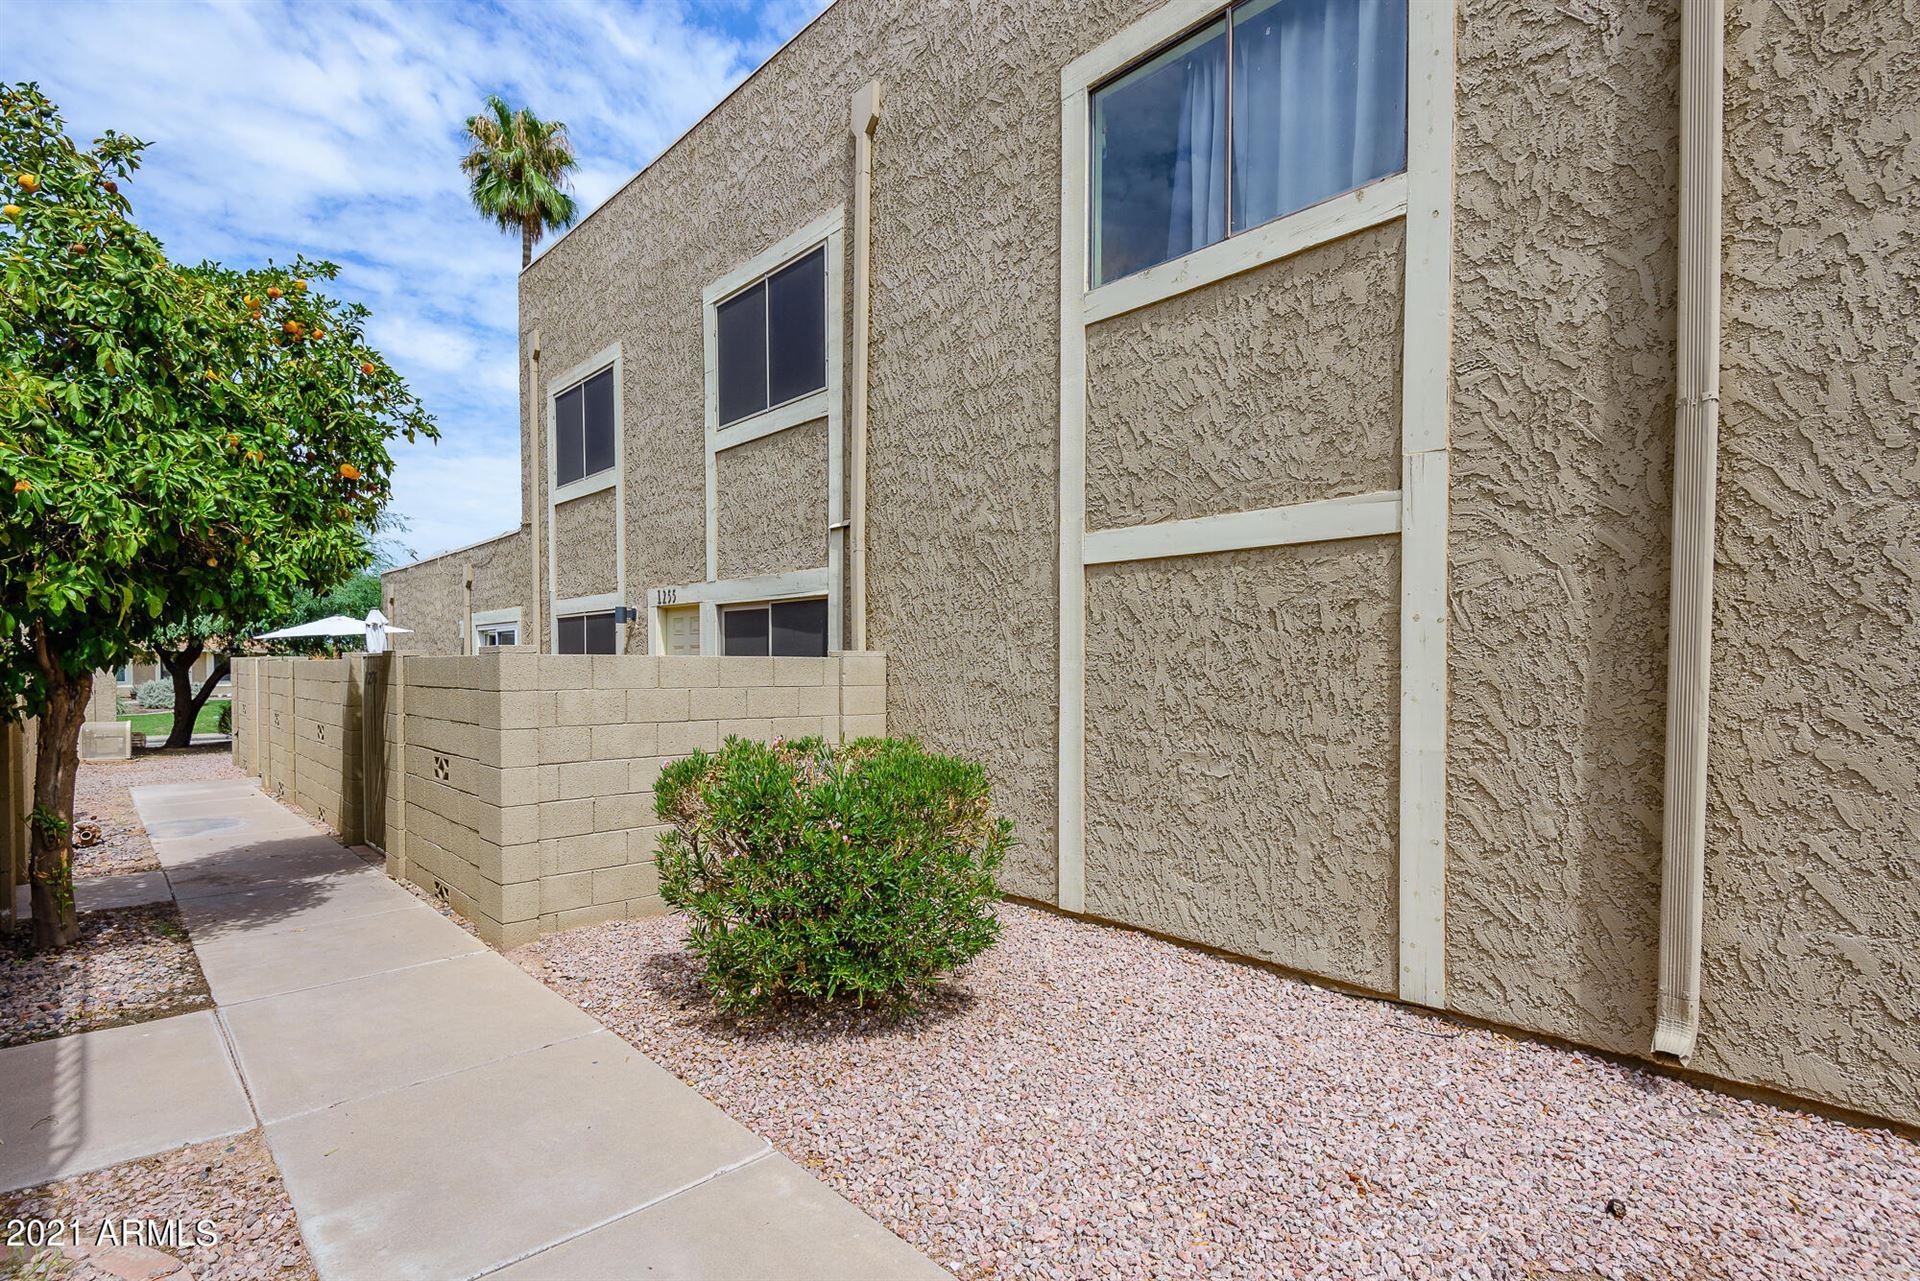 Photo of 1255 N 84TH Place, Scottsdale, AZ 85257 (MLS # 6268960)